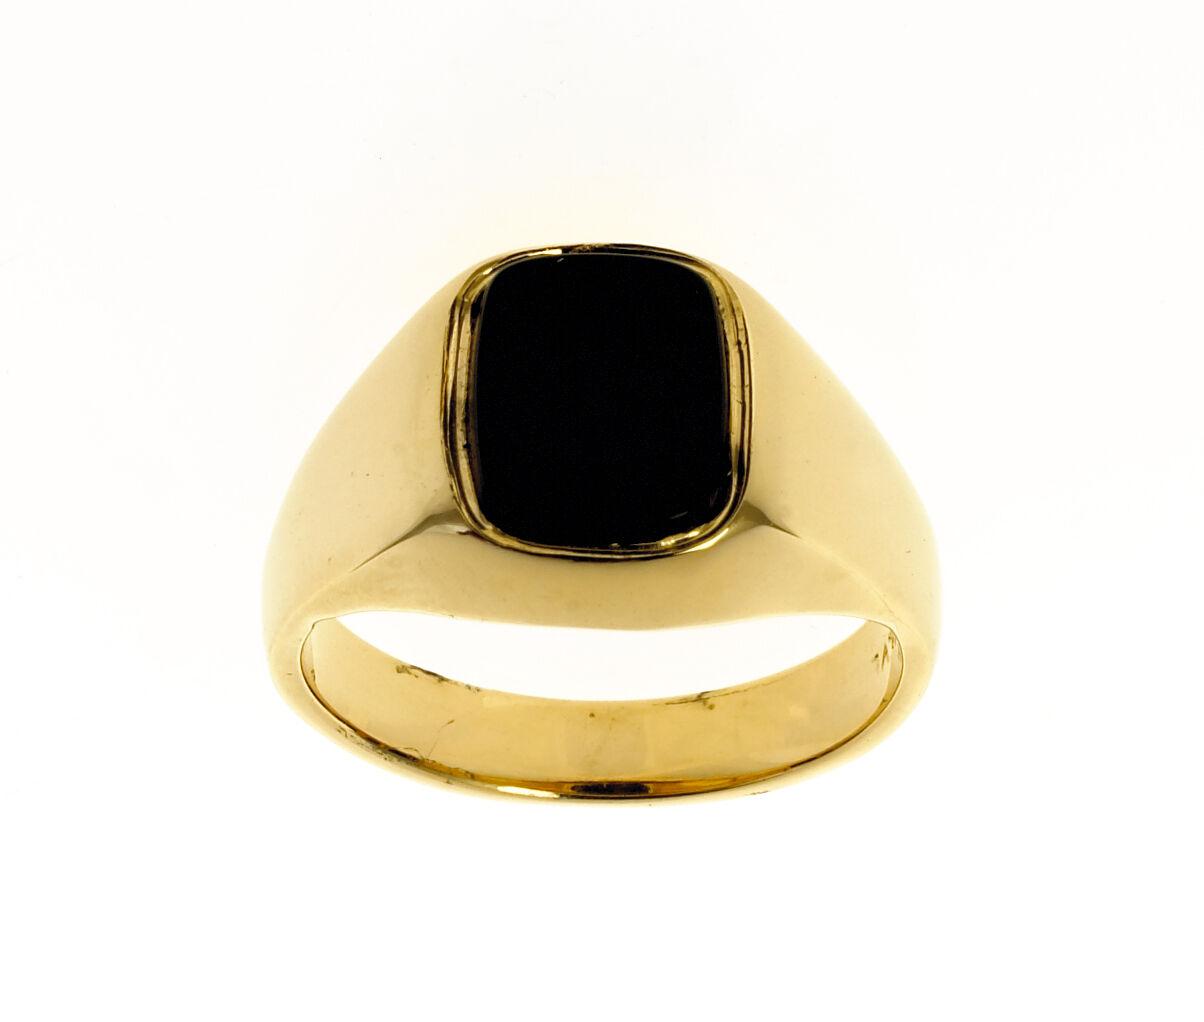 Mens Onyx Ring Gent gold Ring Solid gold Signet Ring Jewellery Quarter B'ham